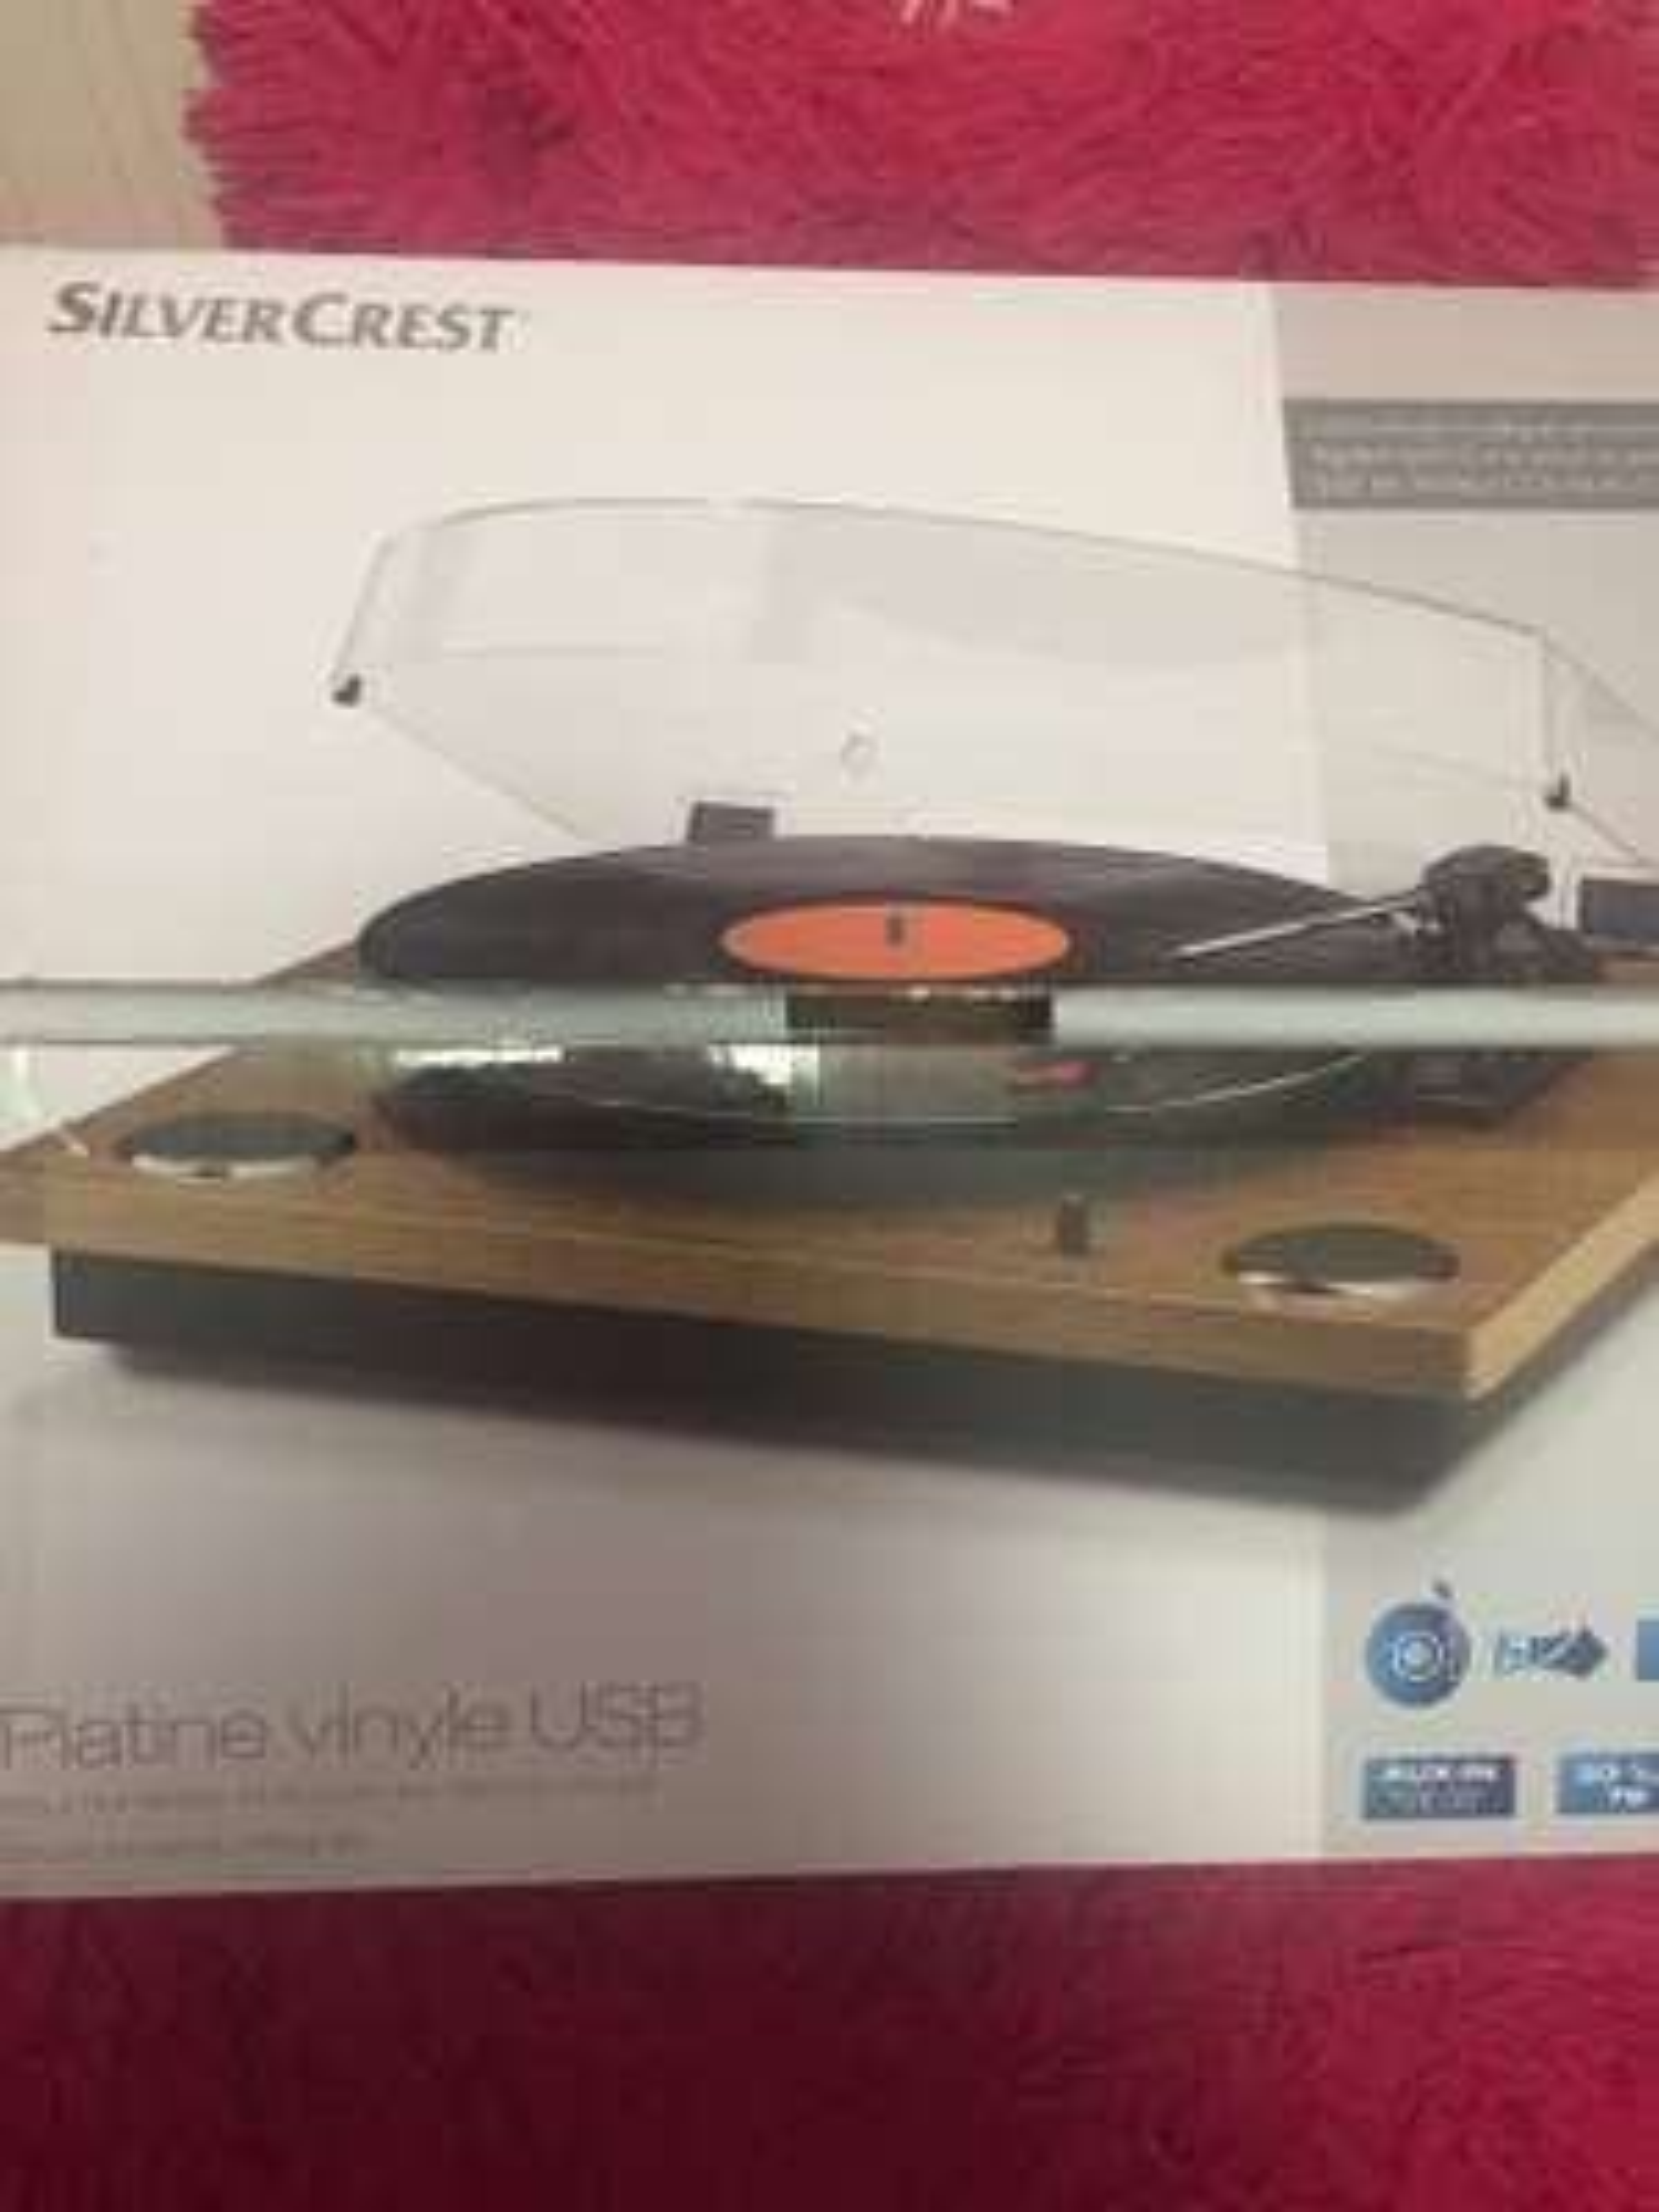 Platine Vinyle usb Silvercrest - Lidl st martin d'heres (38)